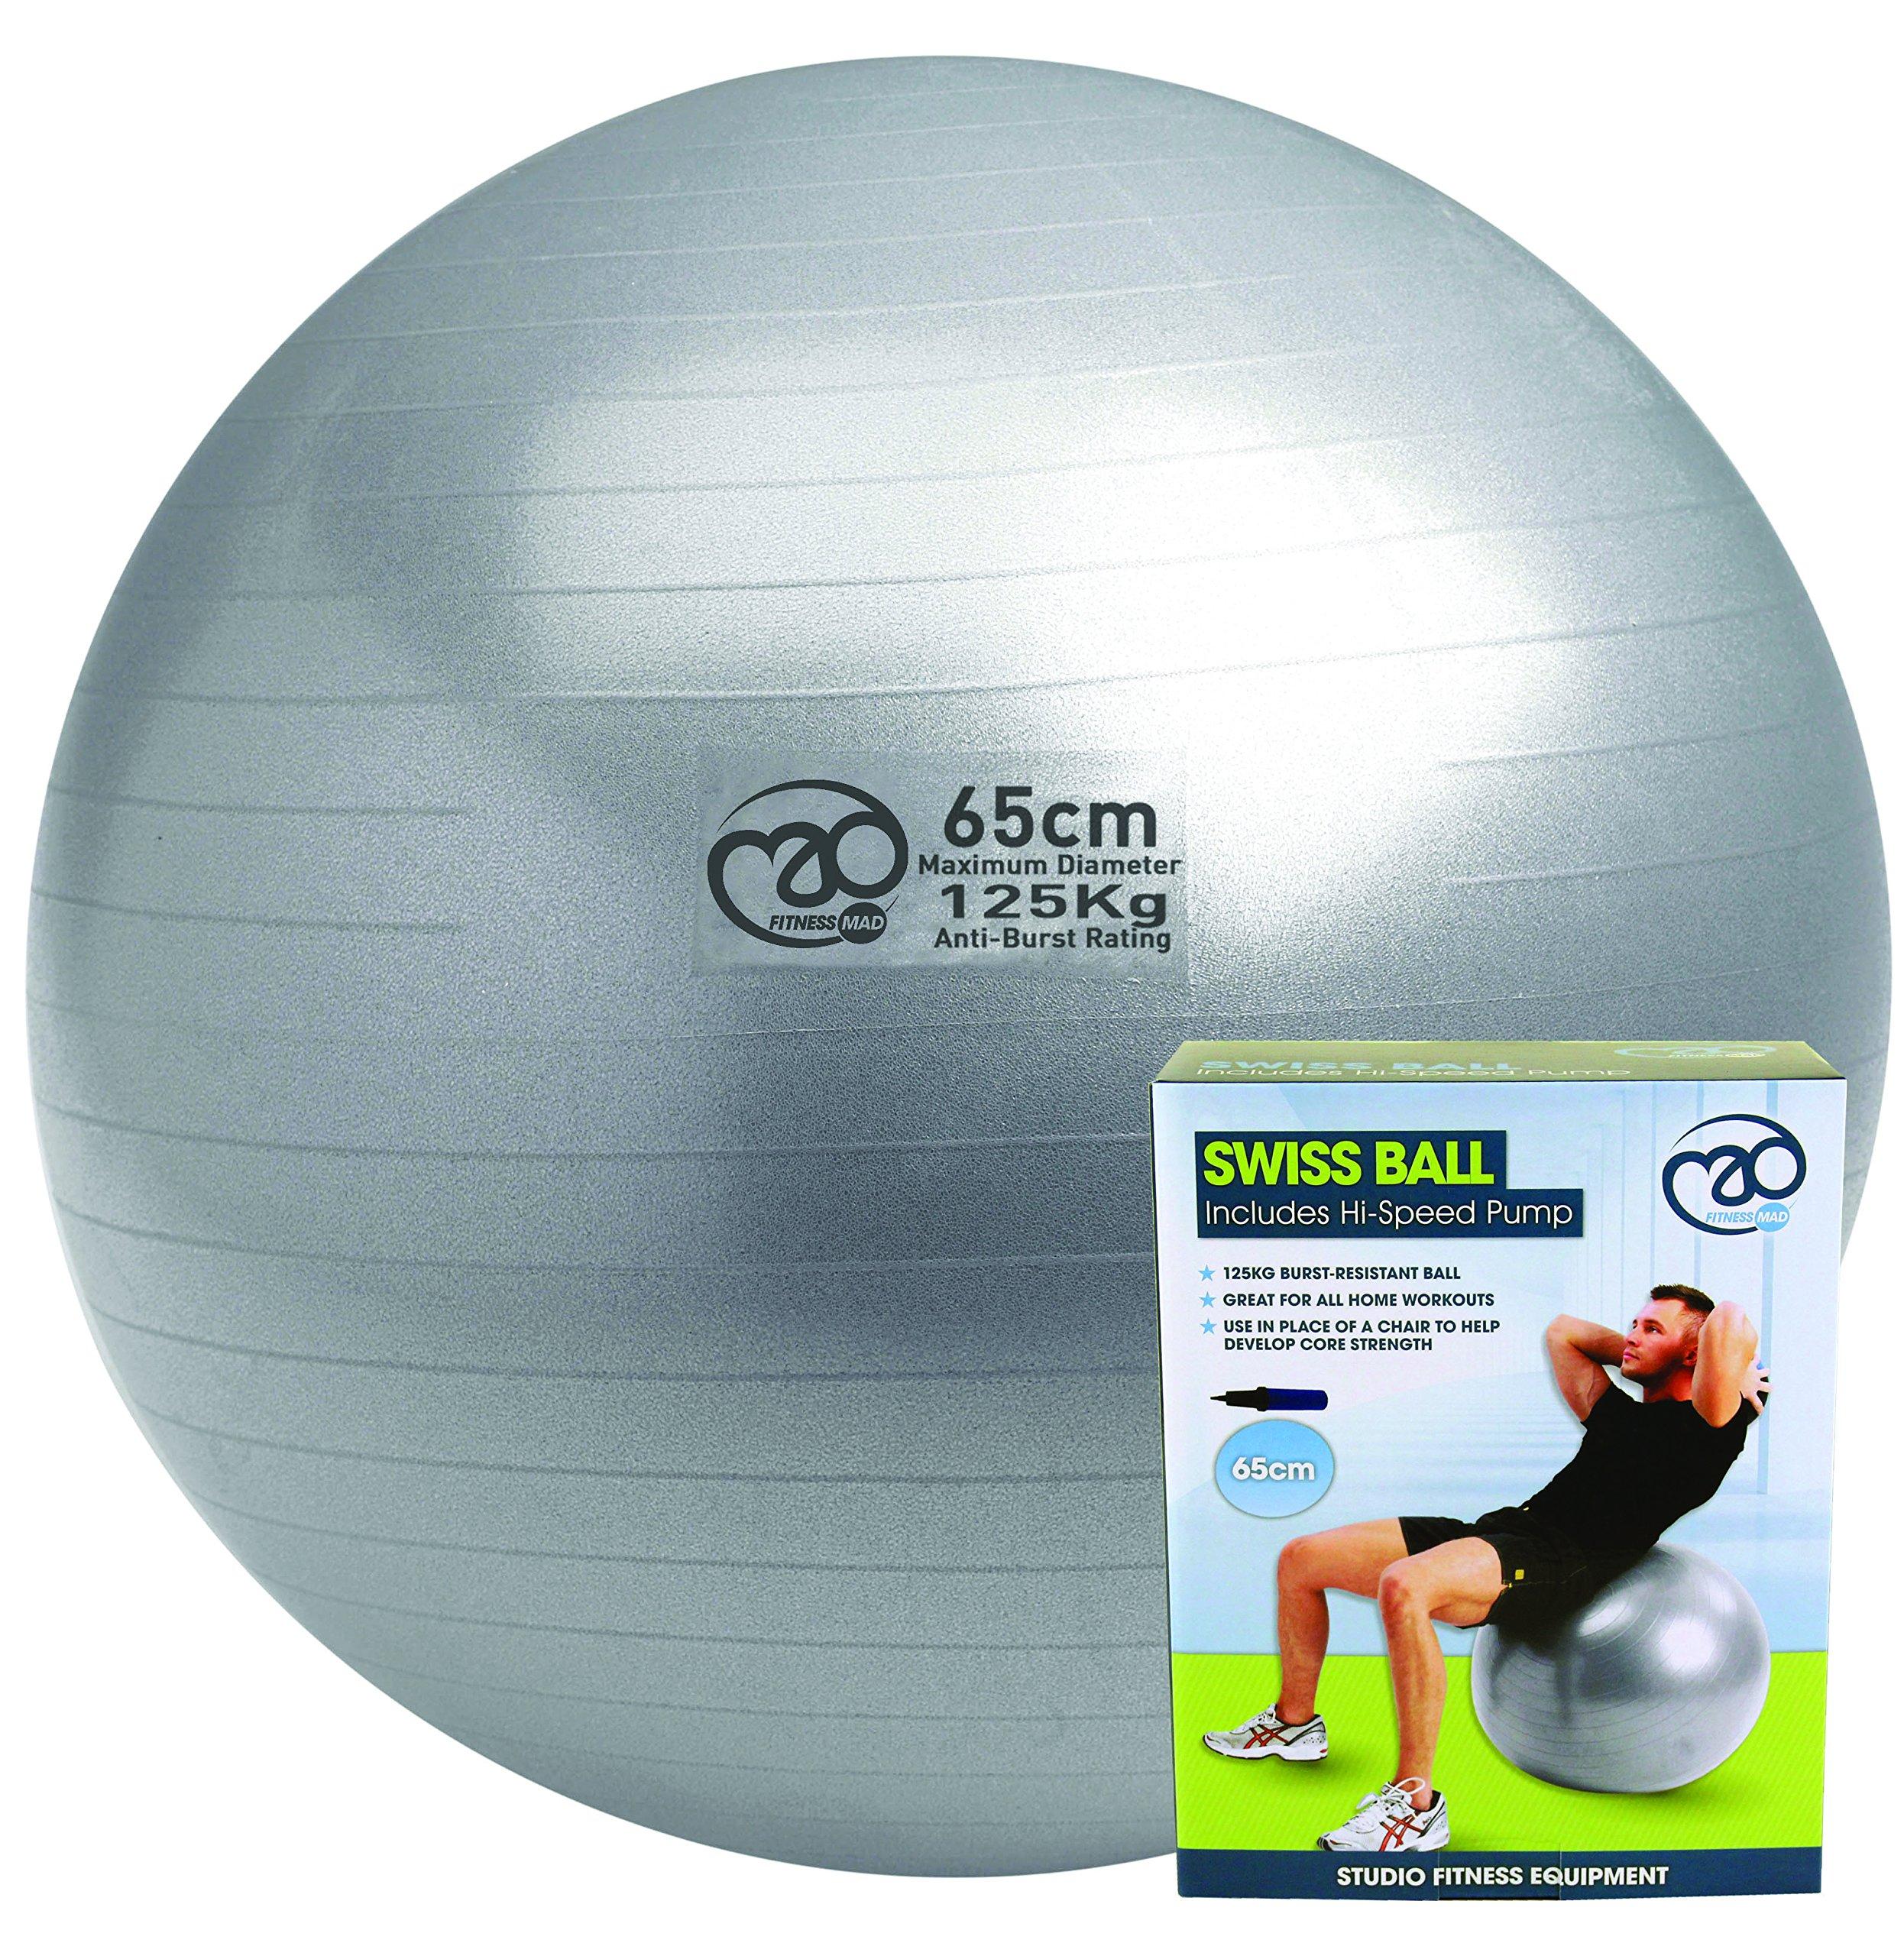 Pilates-Mad - Pelota suiza (soporta cargas de 125 kg) product image